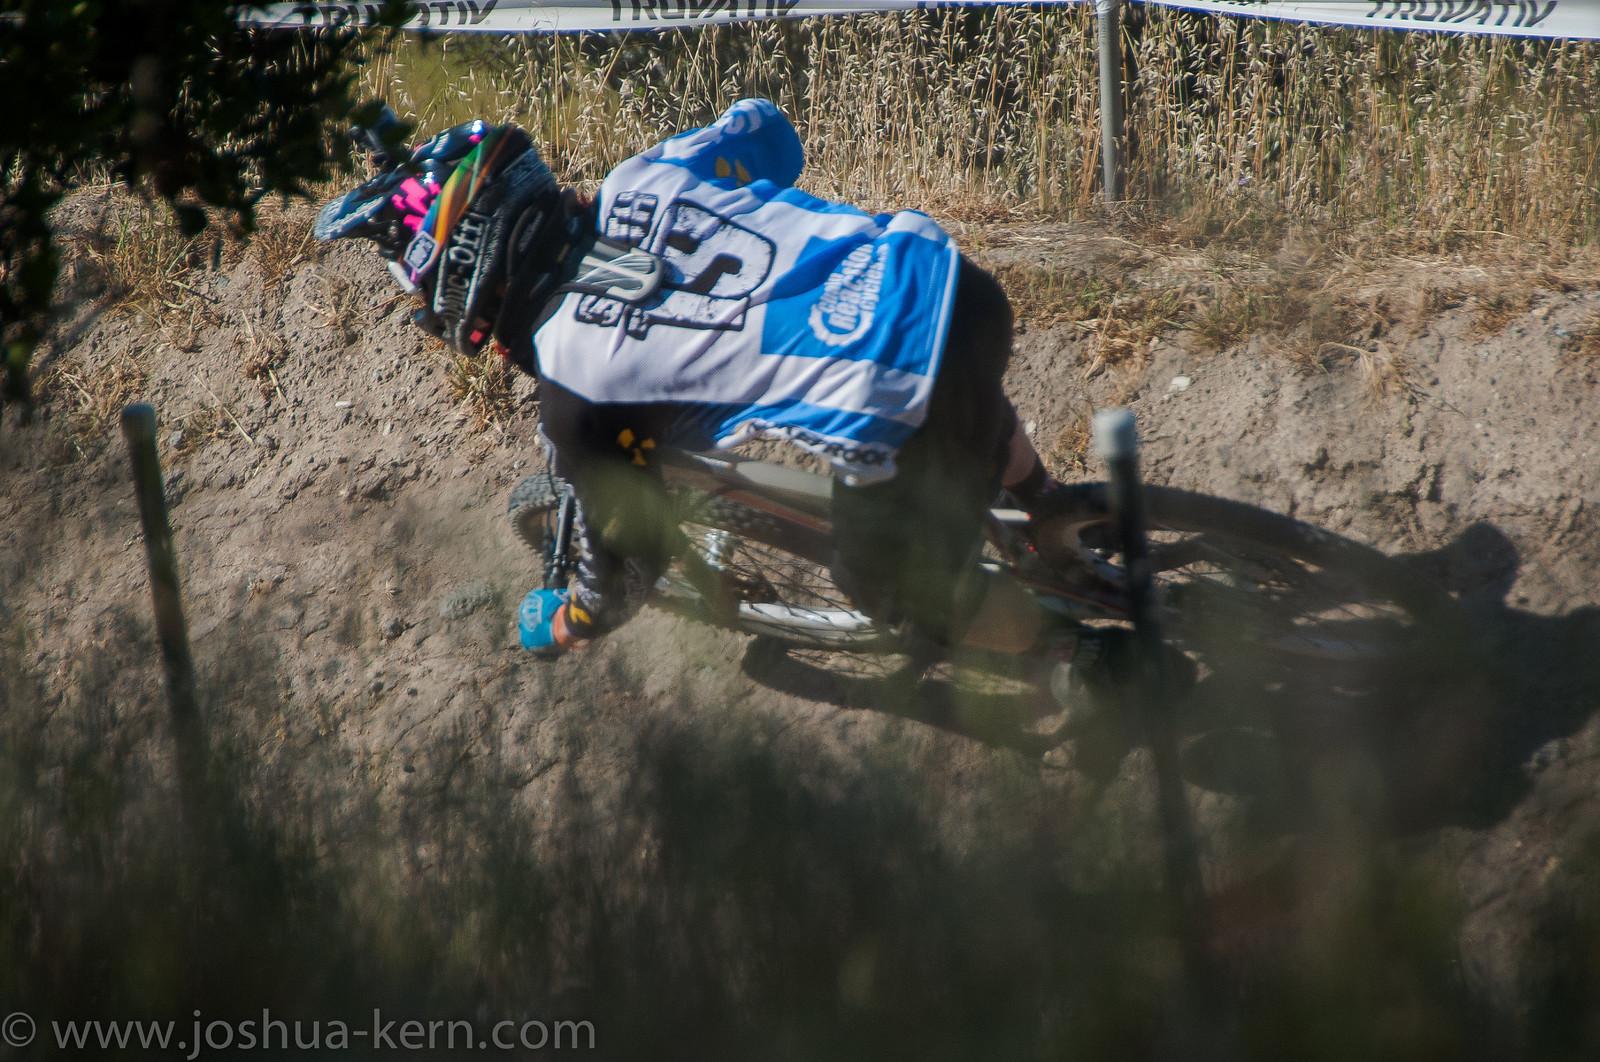 4-19-13DHPractice (14 of 36) - jkern620 - Mountain Biking Pictures - Vital MTB